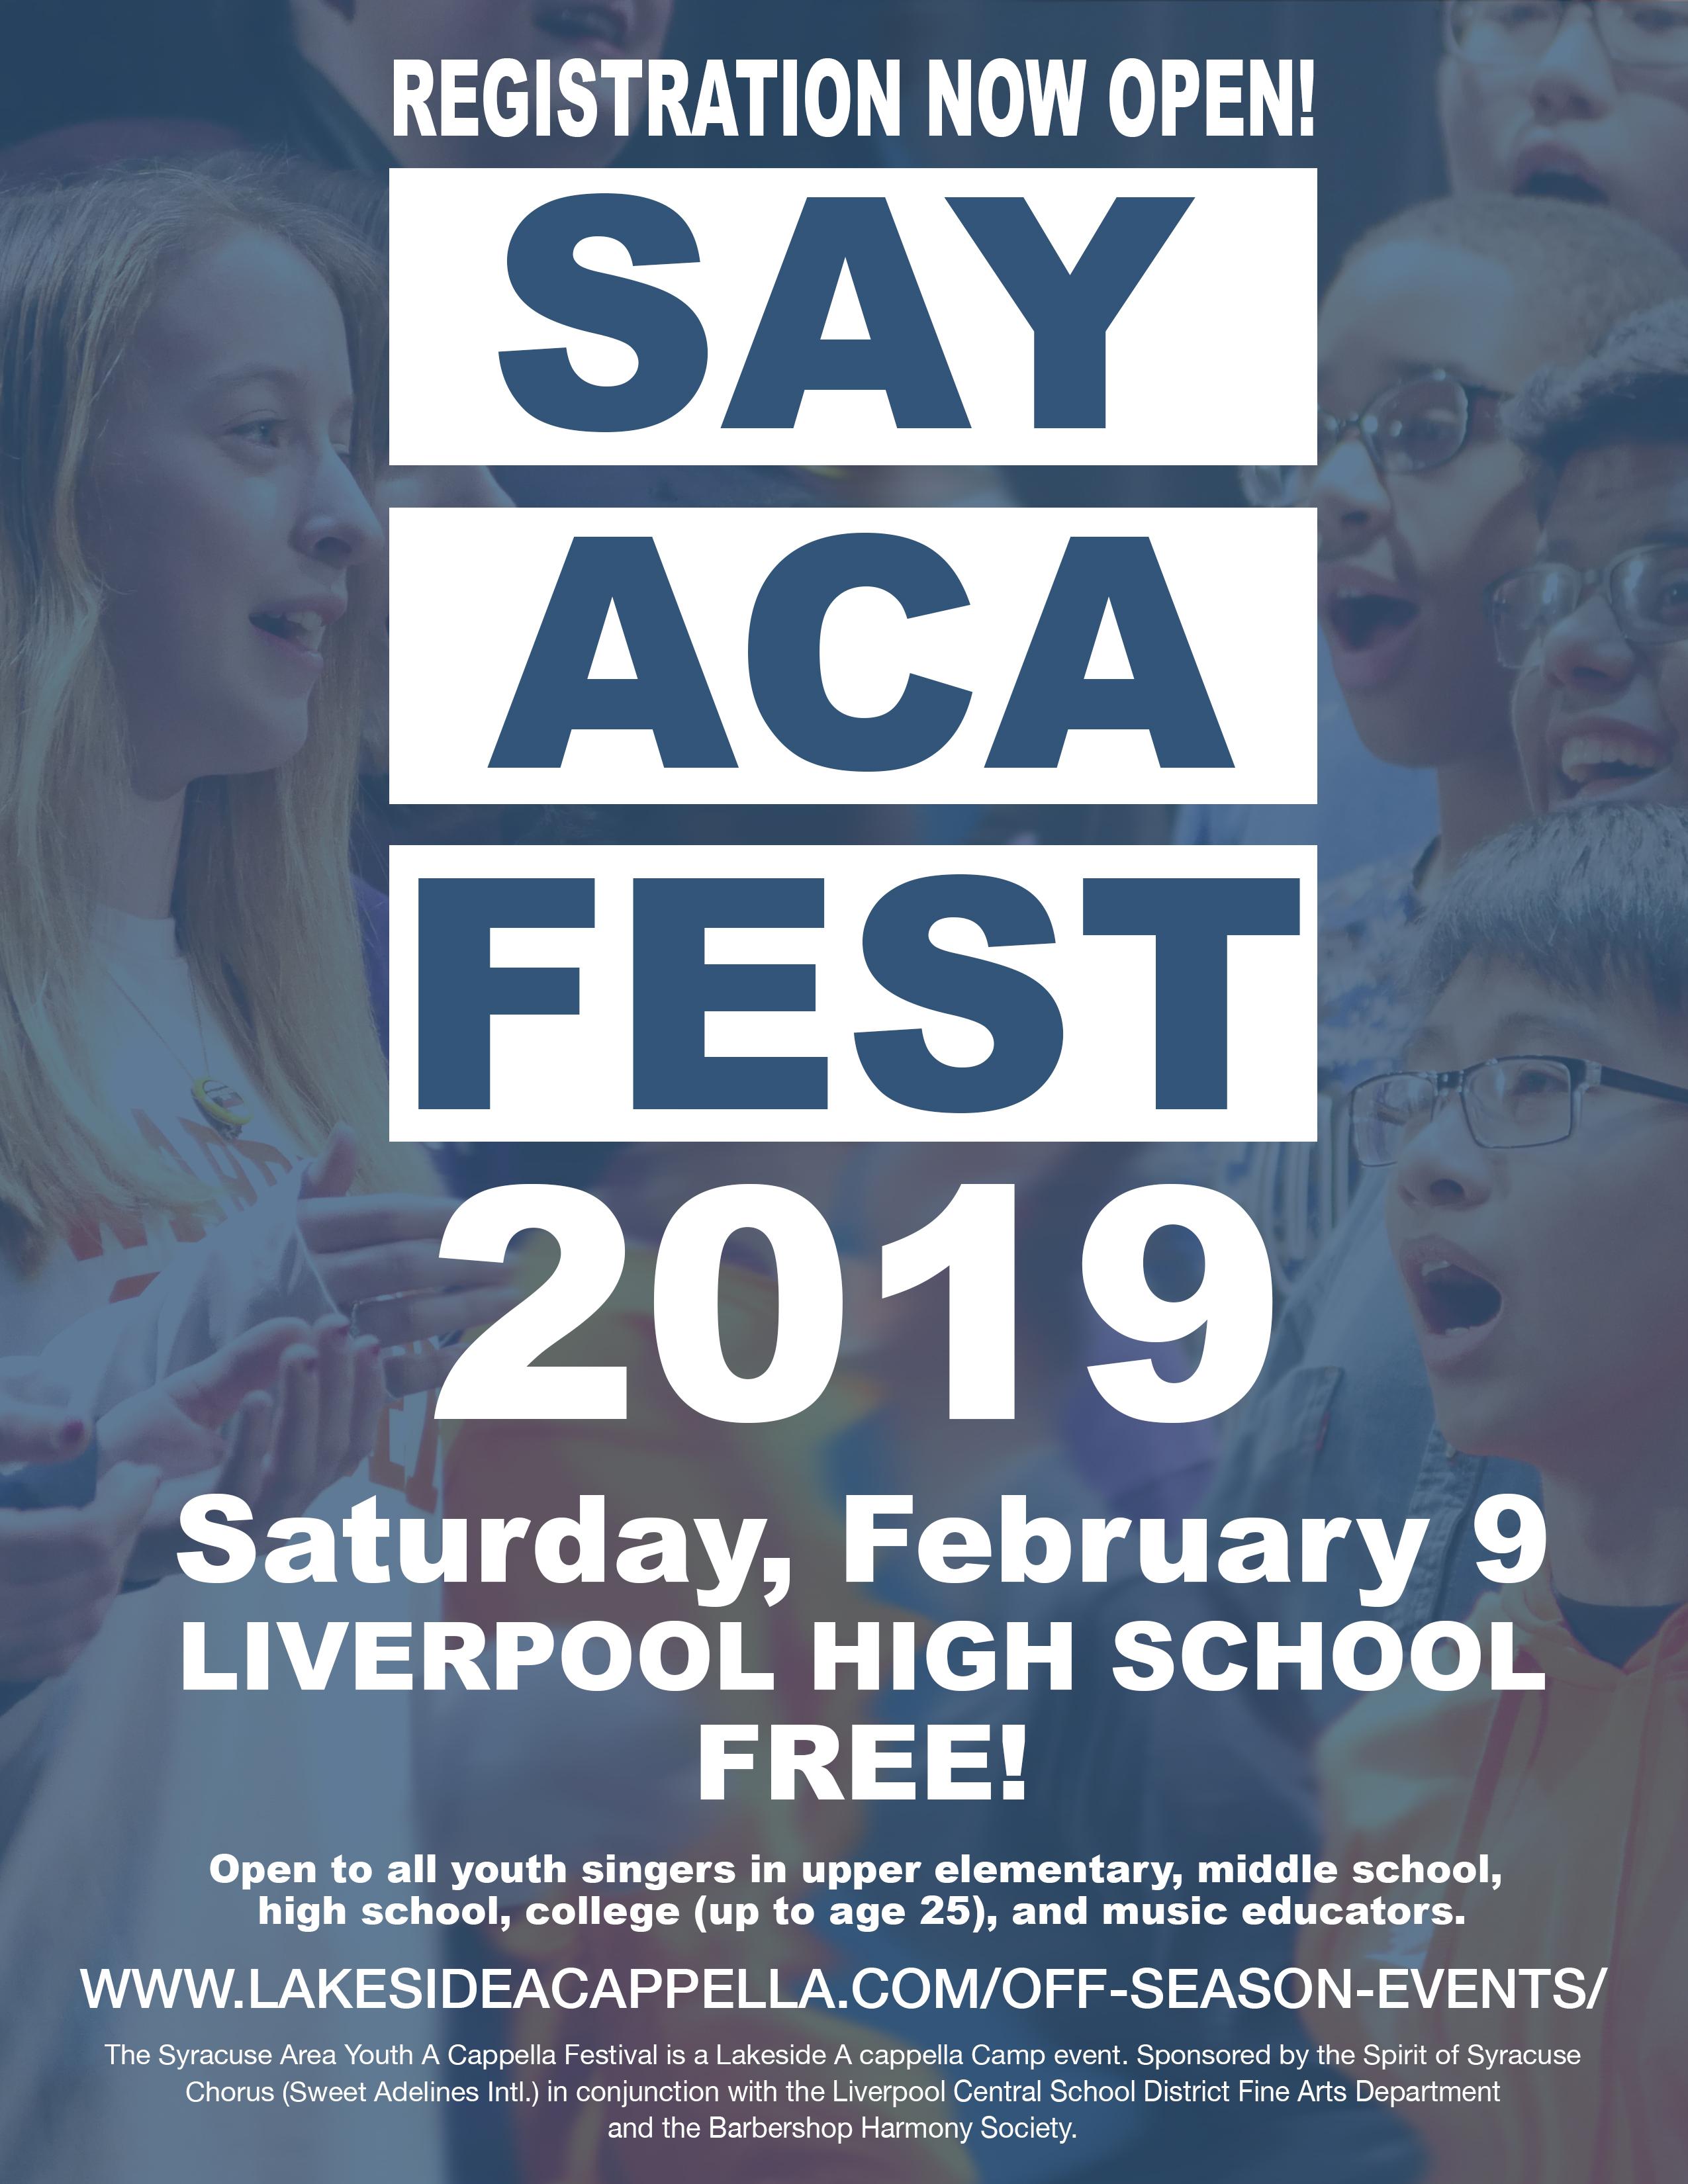 SAYACAFEST 2019 - Feb 09, 2019 | The Spirit of Syracuse Chorus